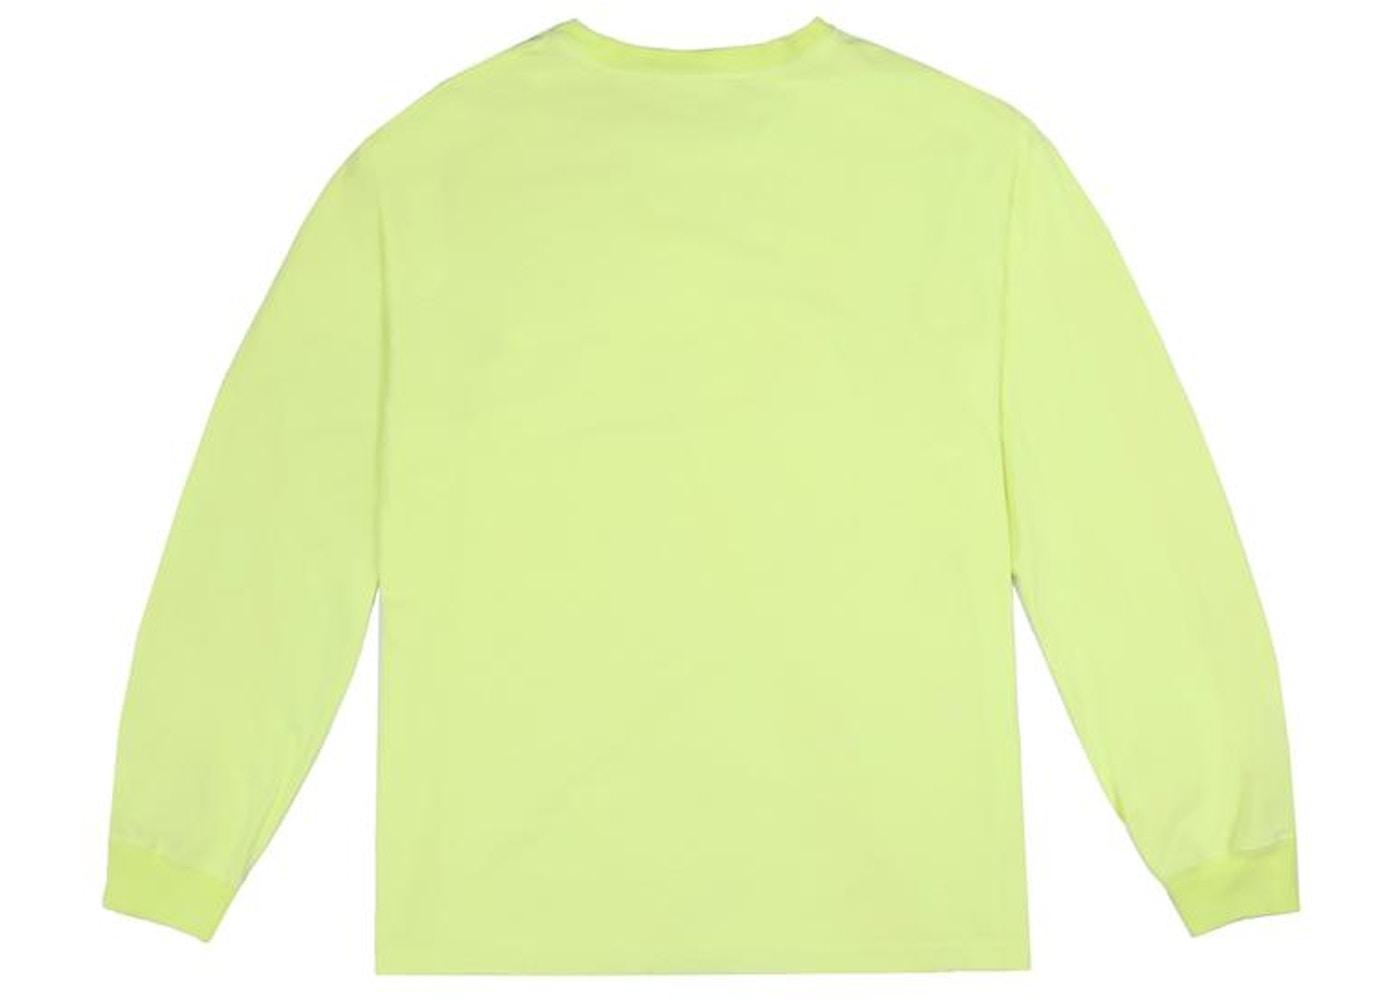 1783992c715a9 Streetwear - adidas Apparel Yeezy Apparel - Total Sold